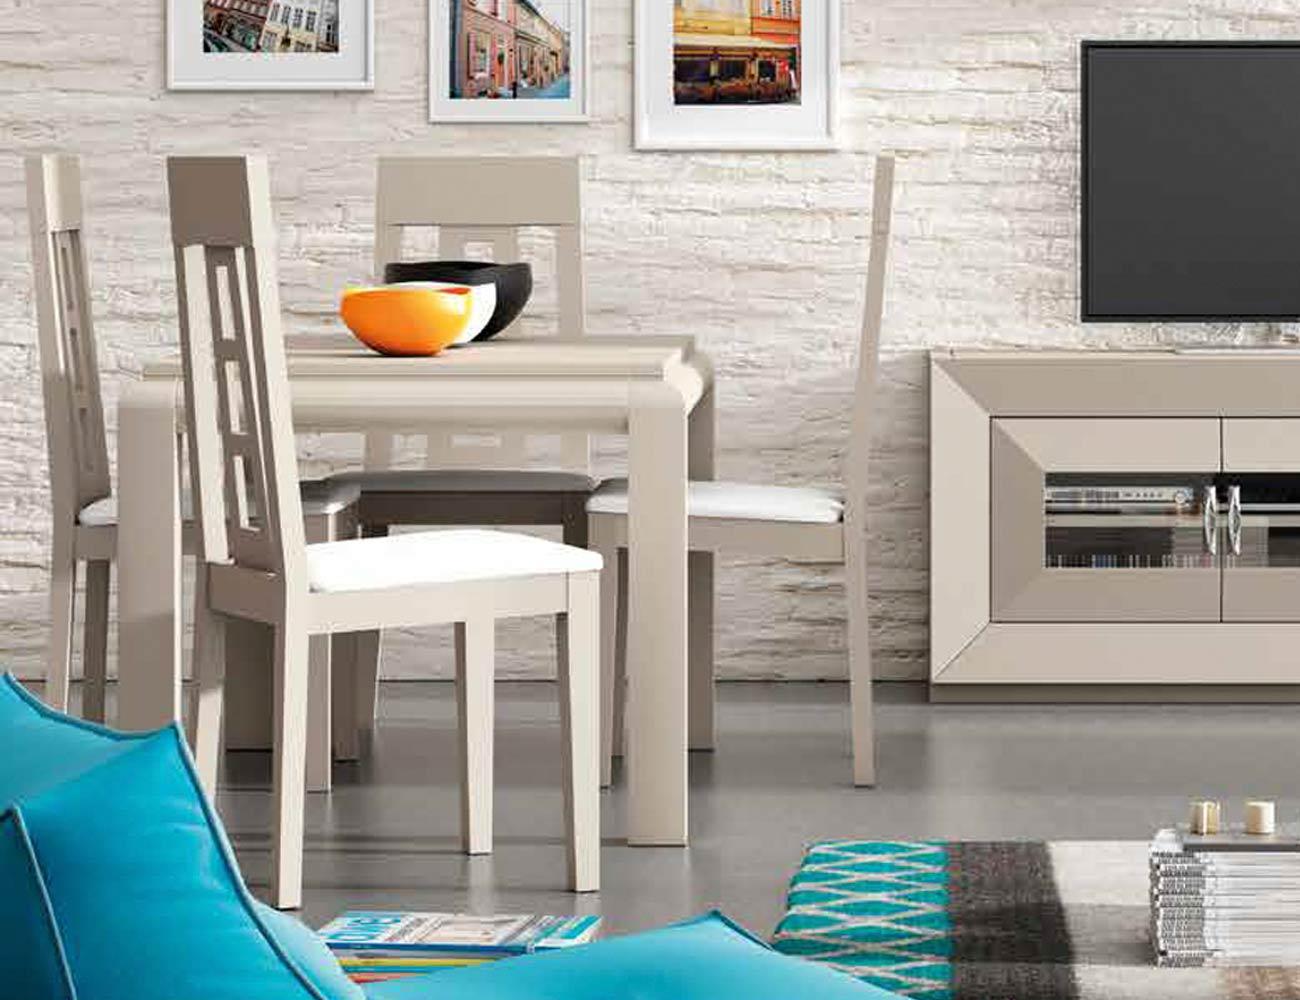 Mesa sillas composicion 12